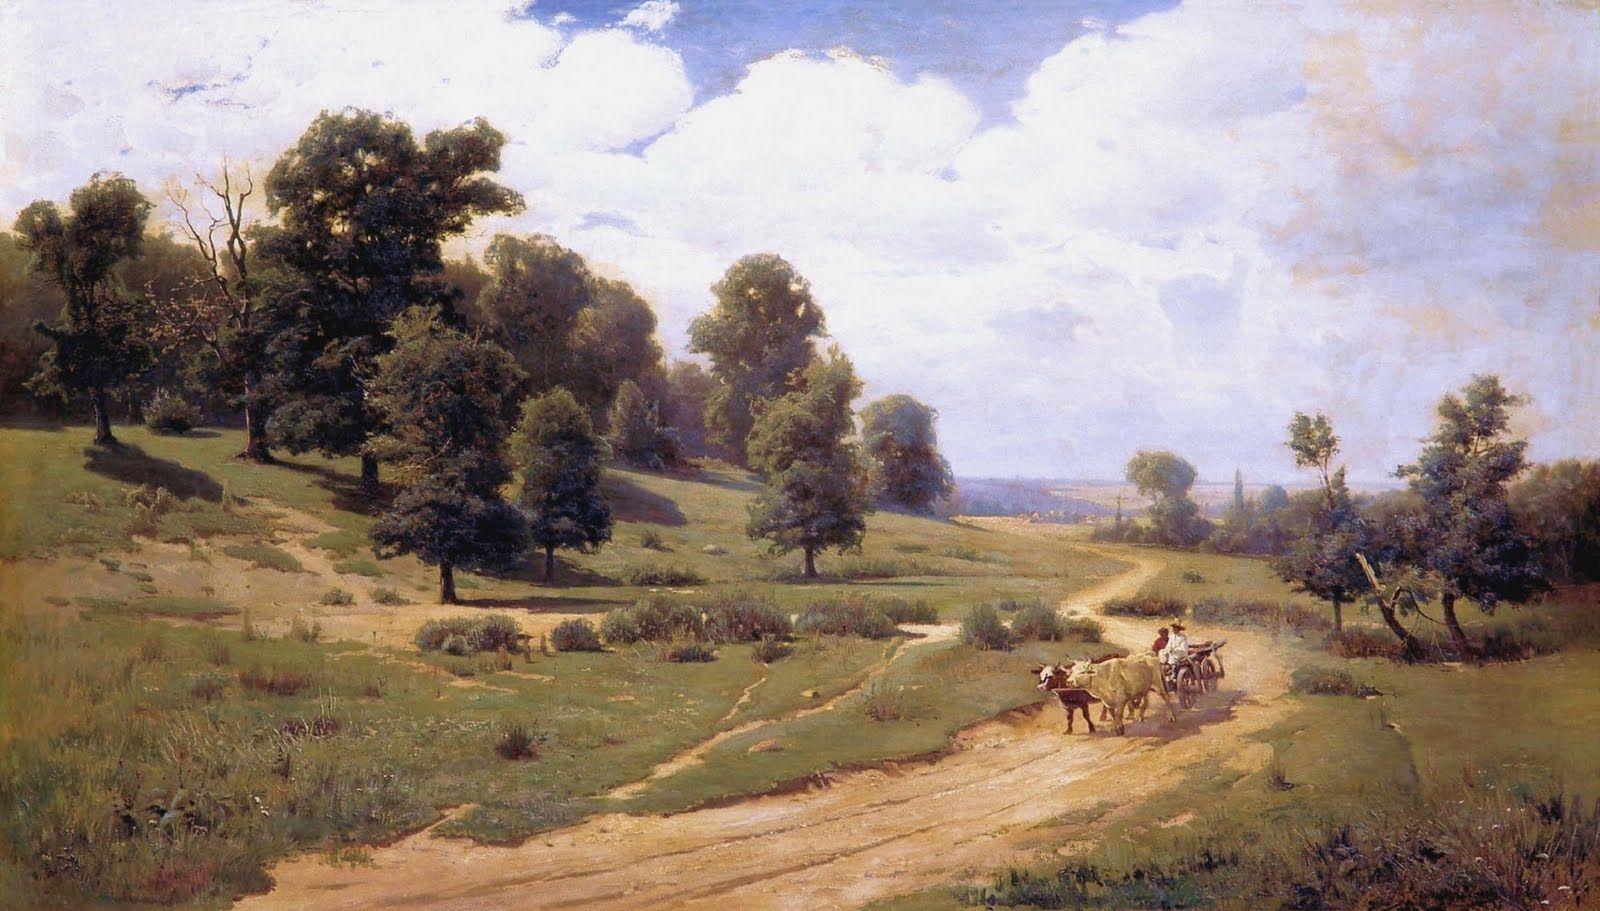 Sergei Vasilkovsky 19th Century Russian Landscape Landscape Paintings Landscape